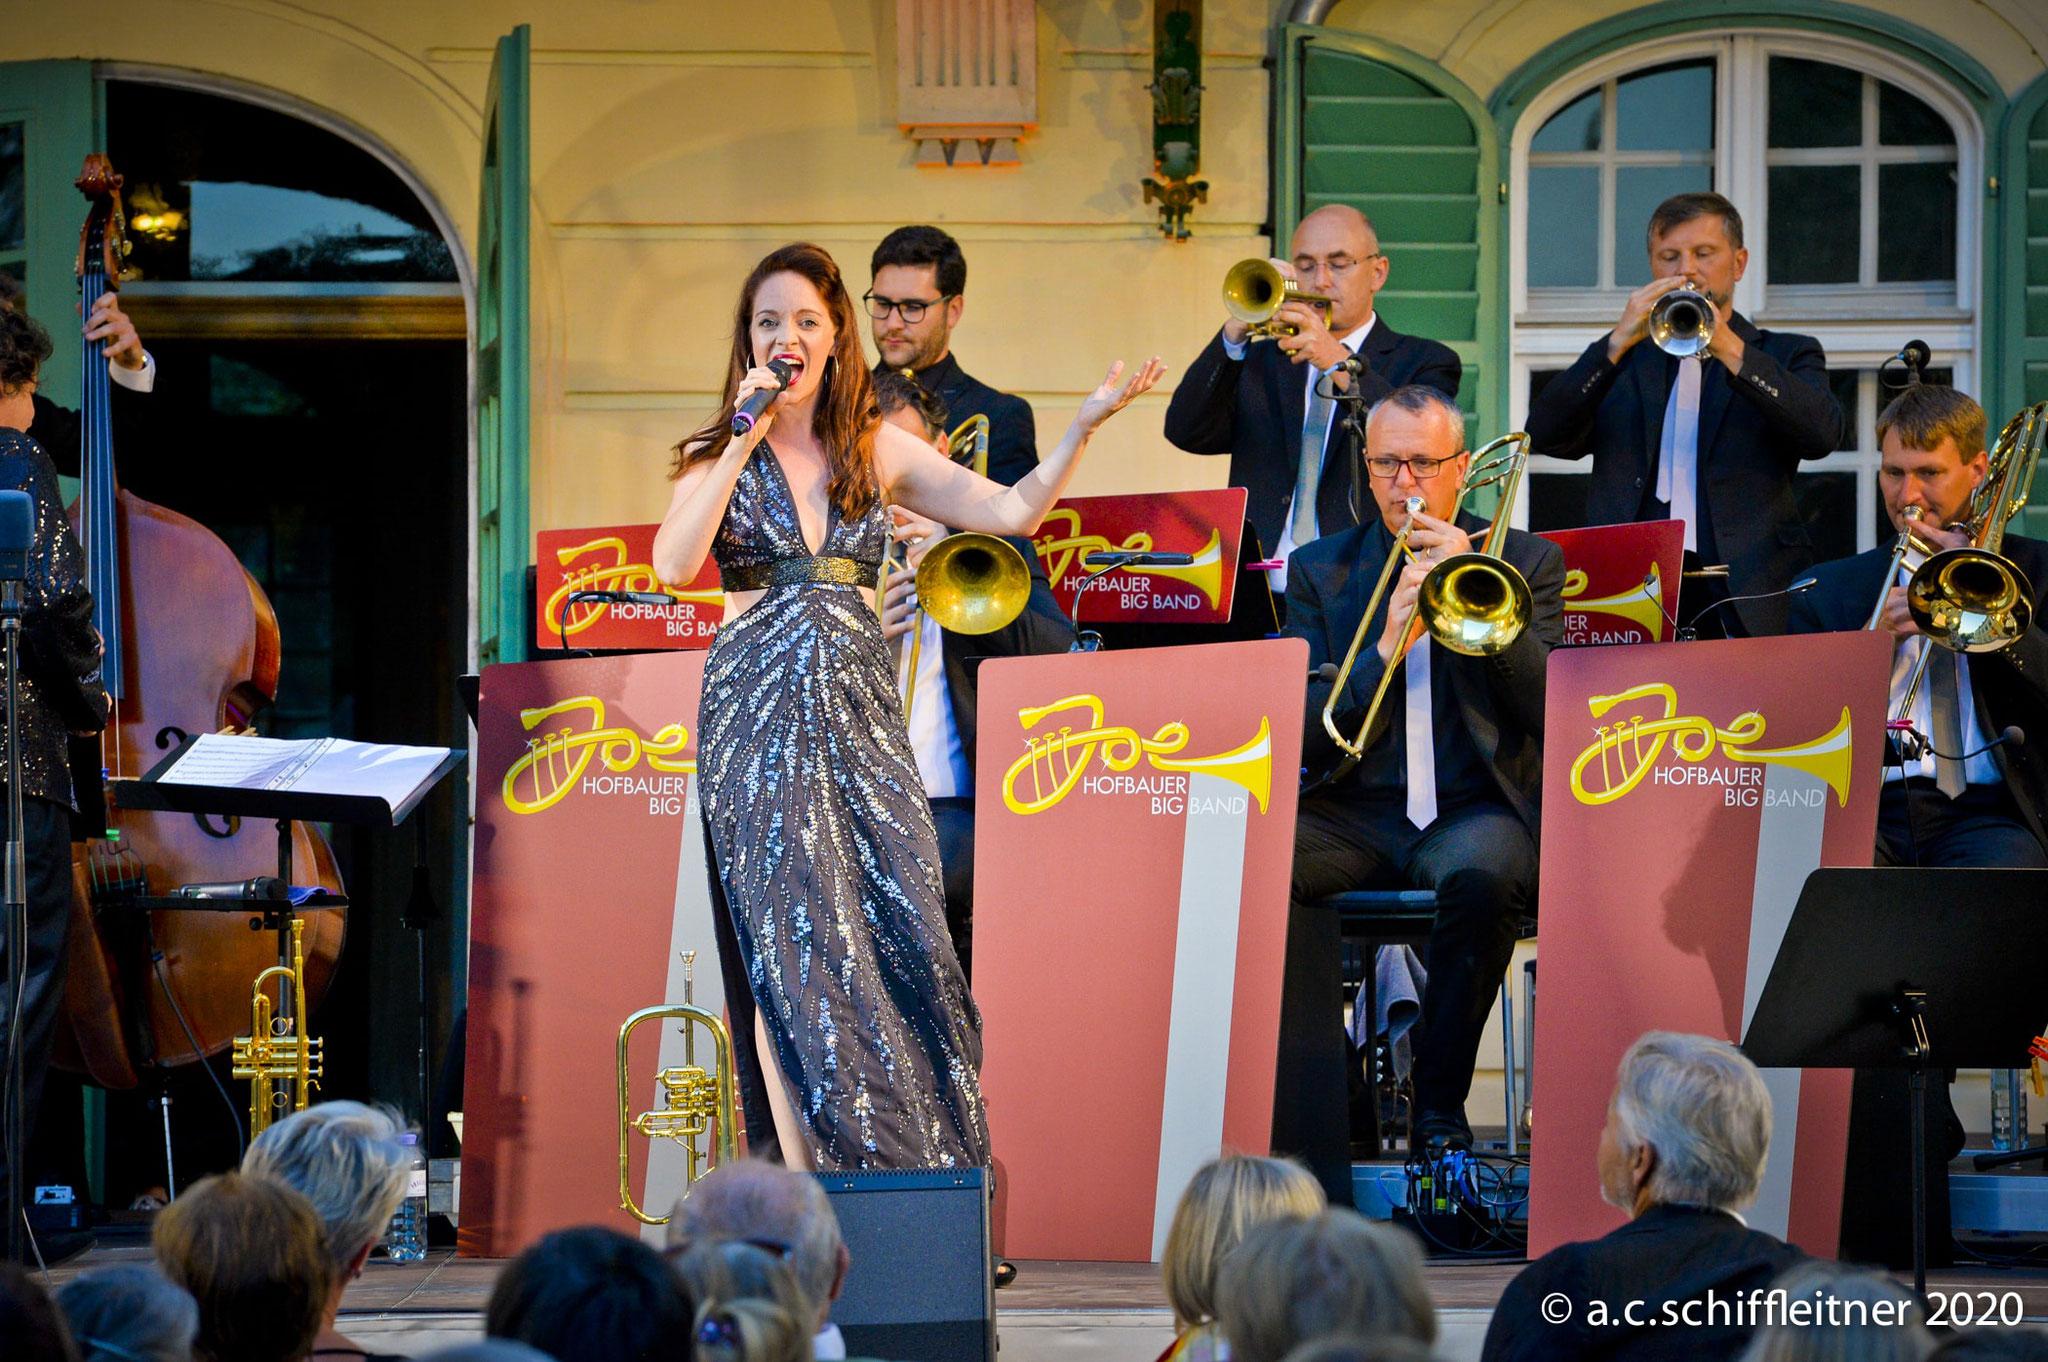 Joe Hofbauer Big Band | Foto: A.C. Schiffleitner